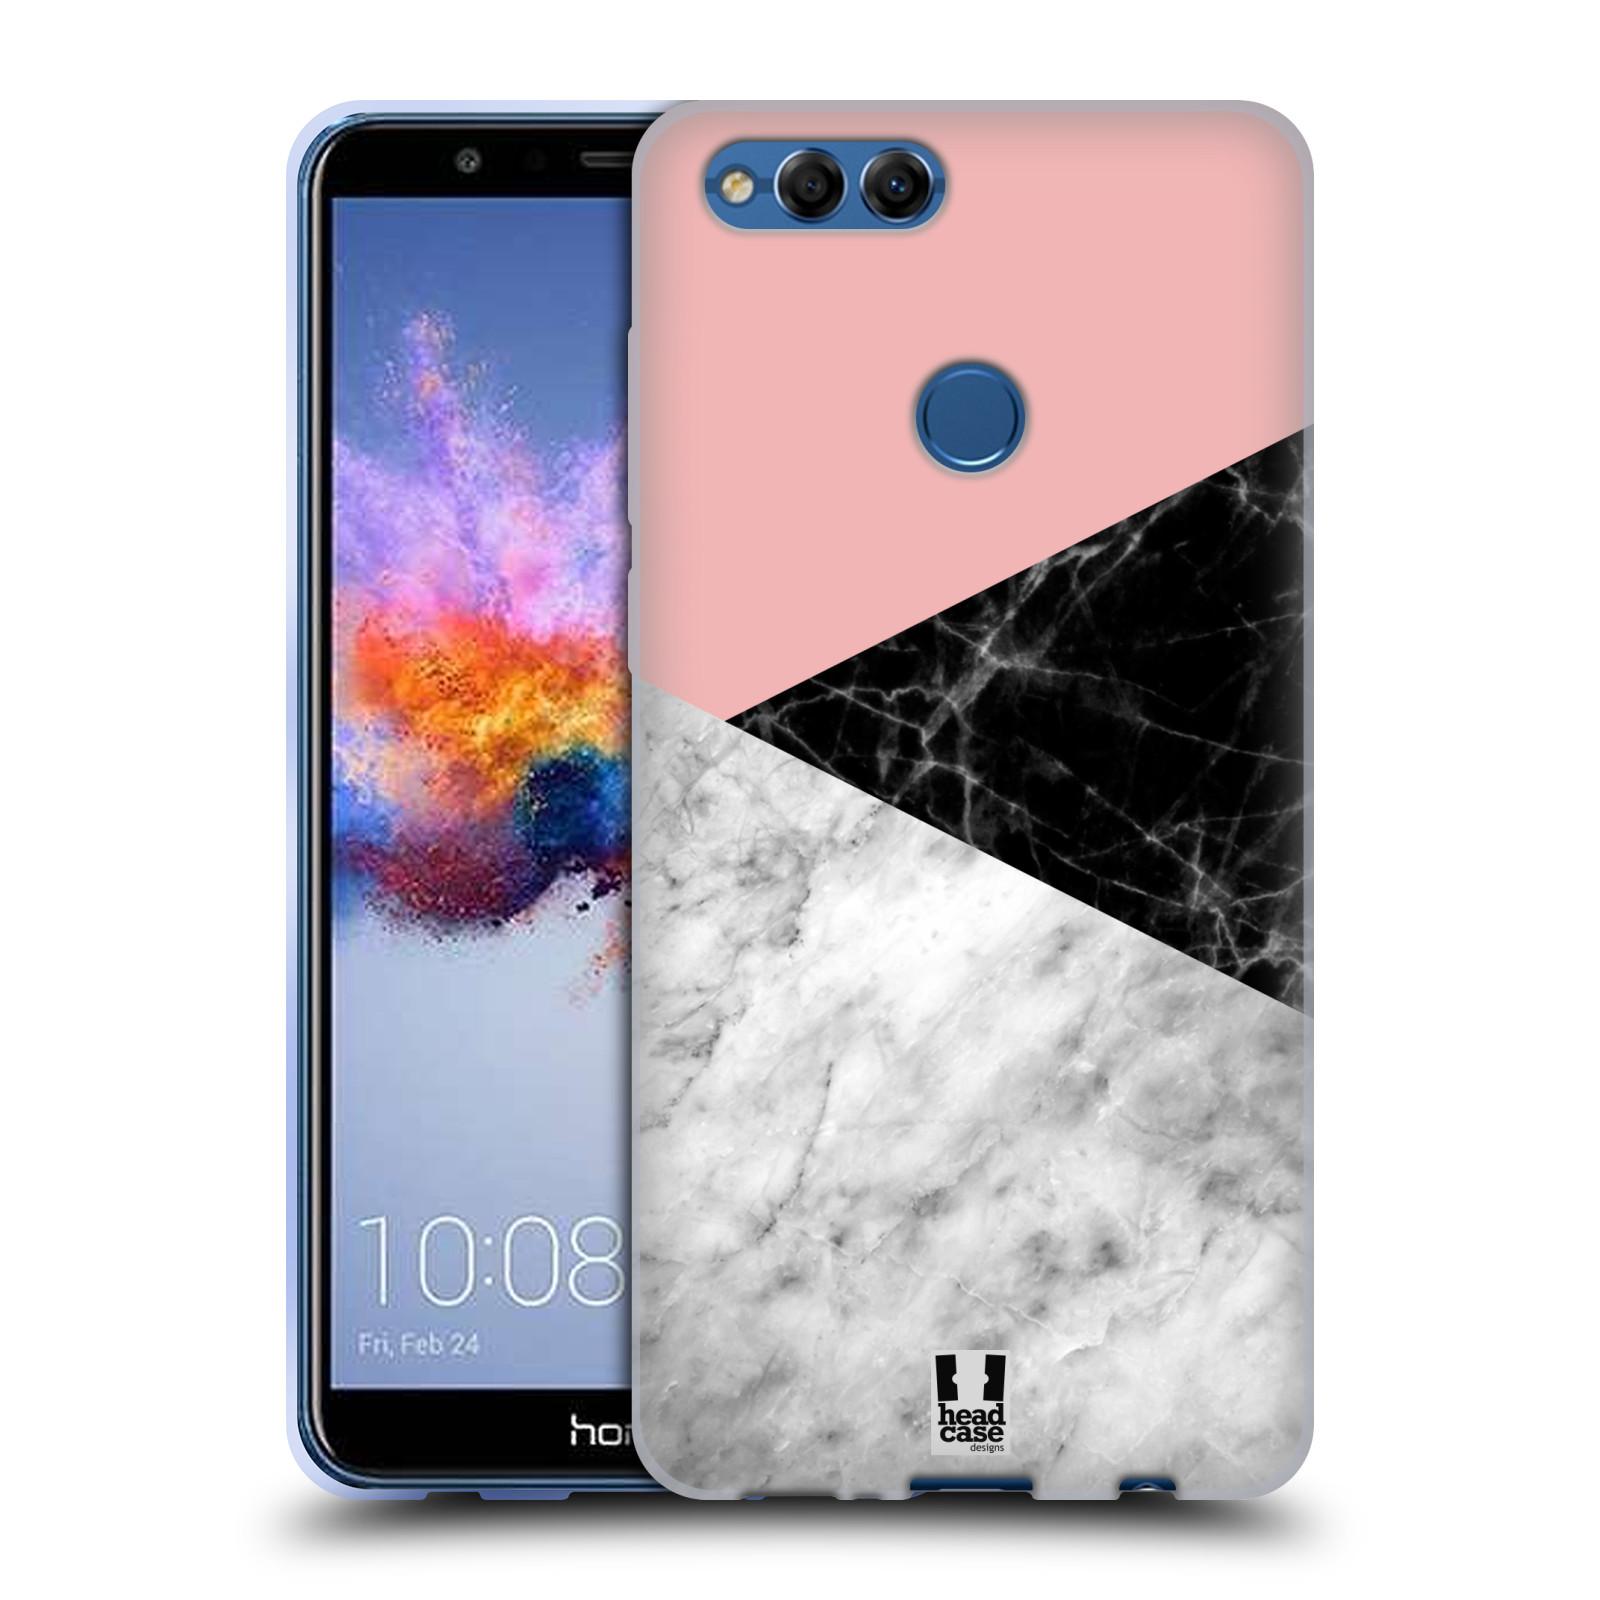 Silikonové pouzdro na mobil Honor 7X - Head Case - Mramor mix